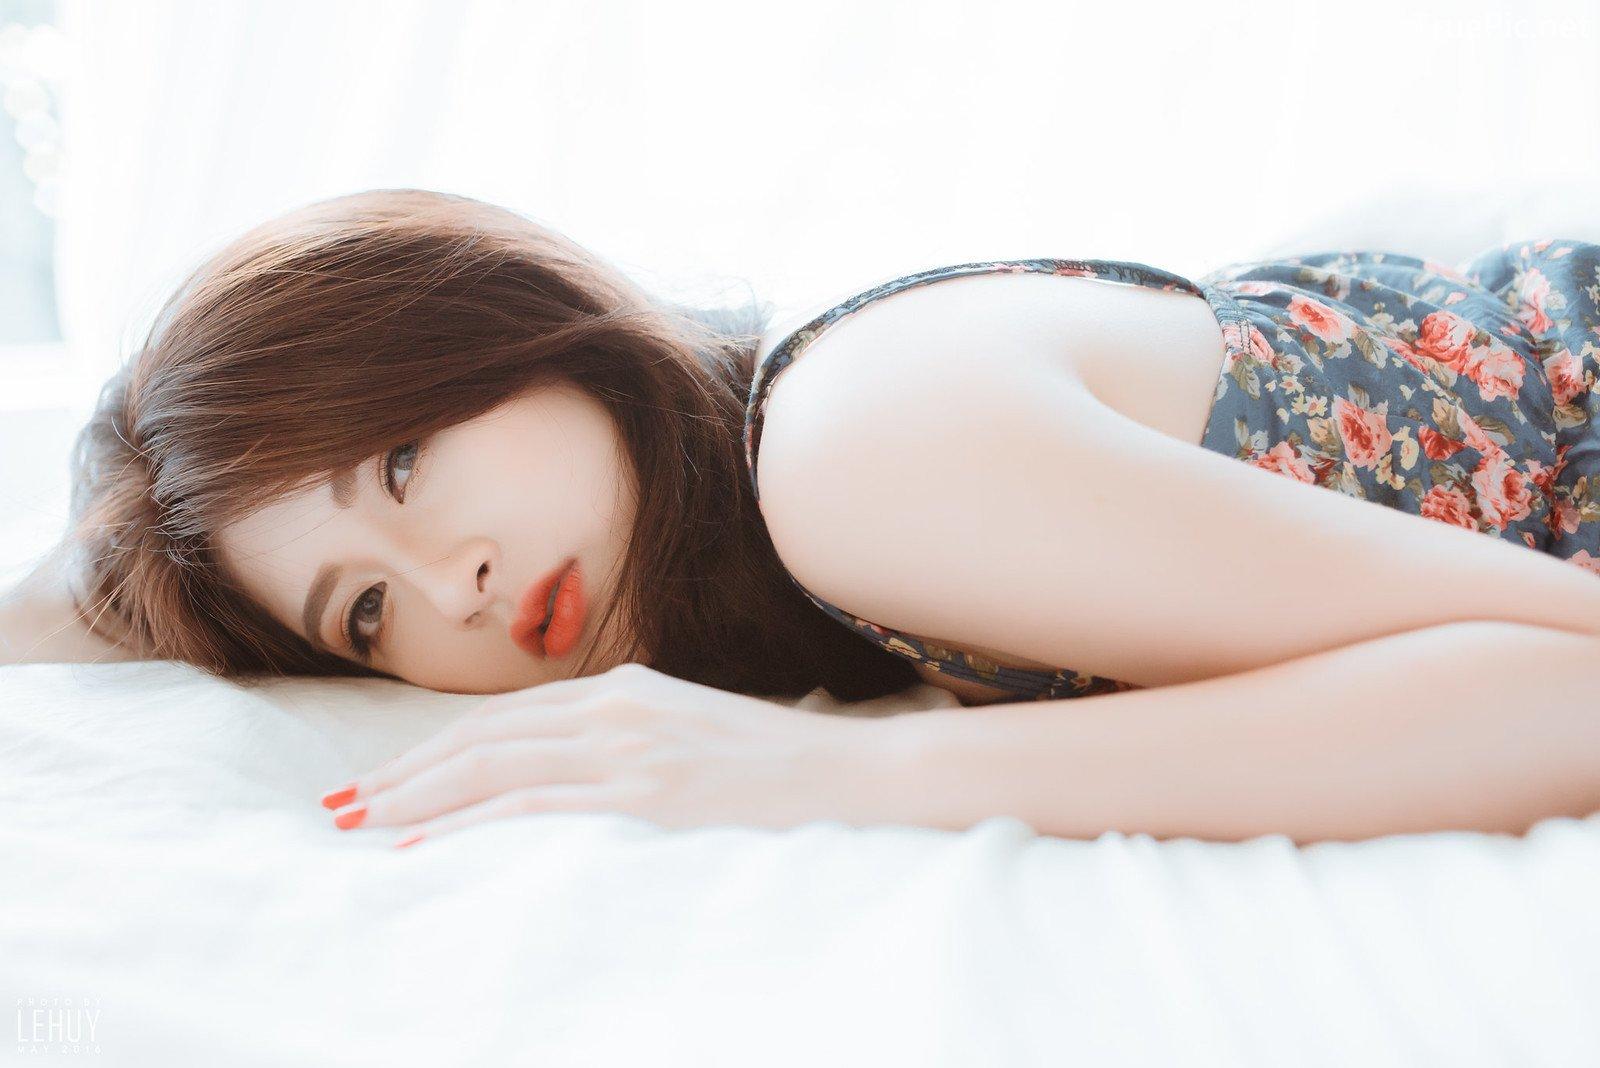 Image-Vietnamese-Hot-Girl-Photo-Beautiful-Twin-Sister-TruePic.net- Picture-9